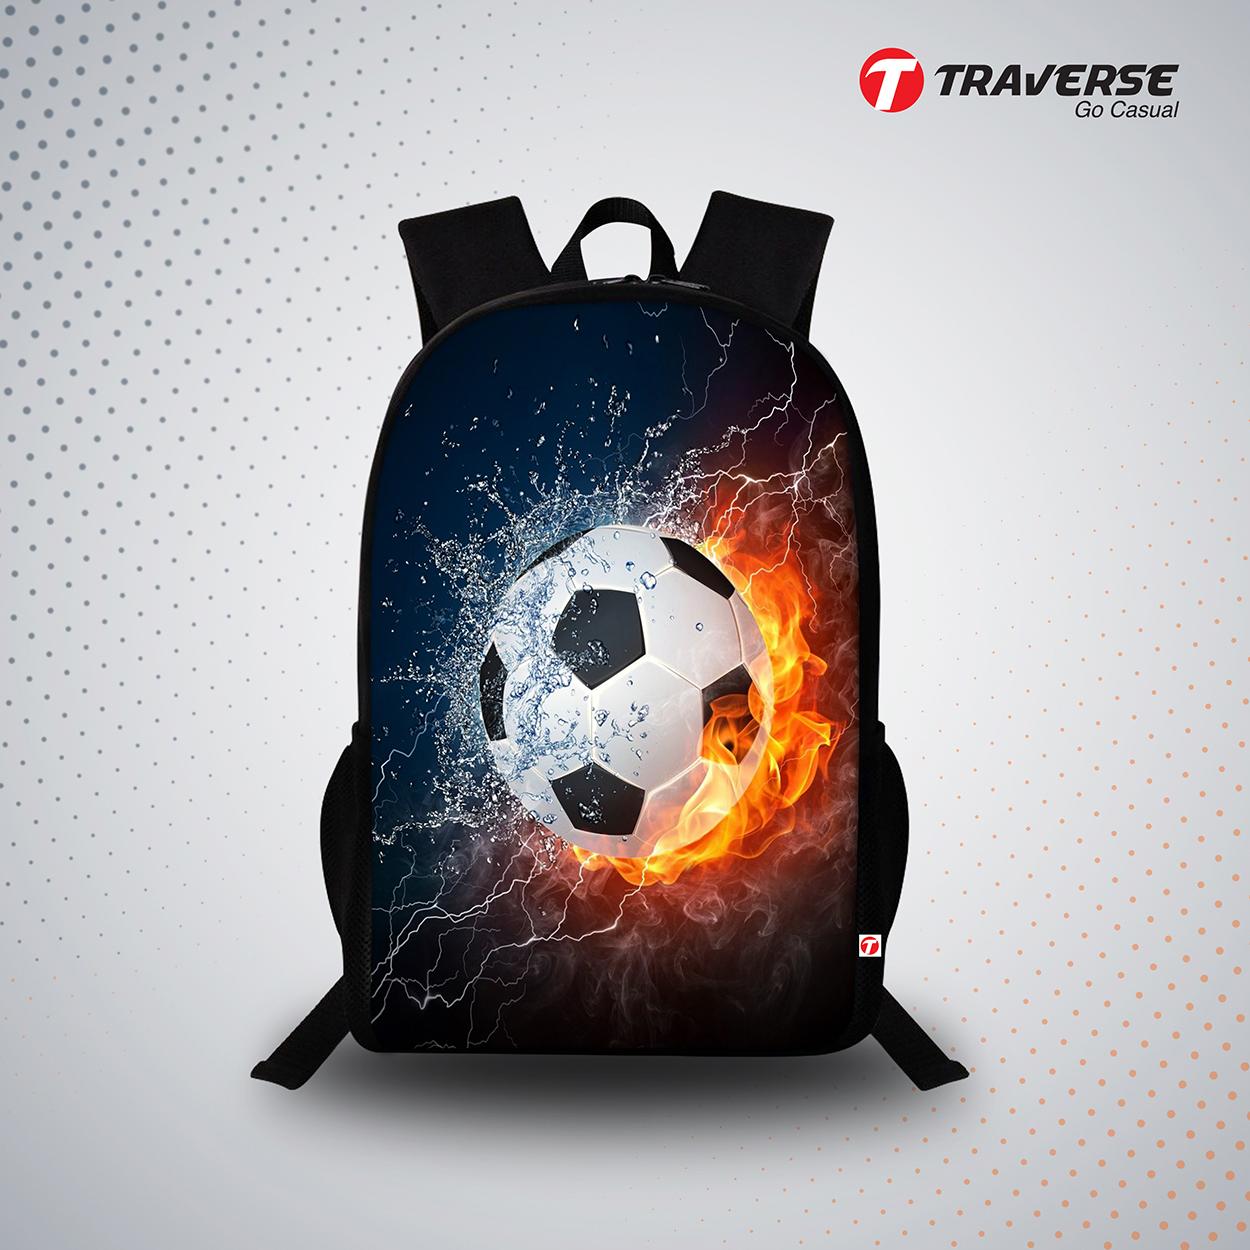 Football Backpack For Travel, School & College (boys & Girls)